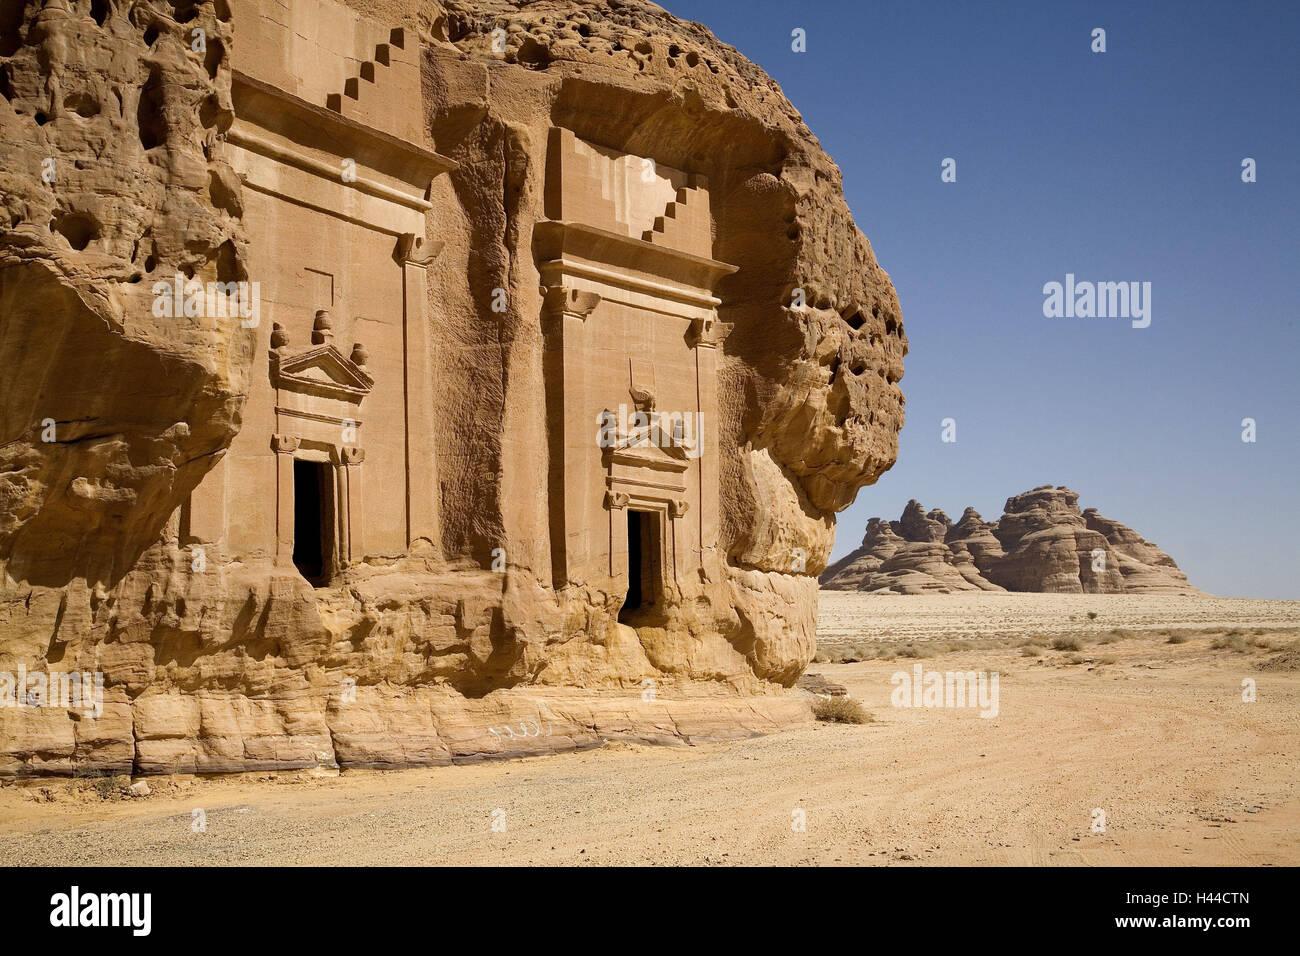 L'Arabie saoudite, Tabuk, Madain Saleh, Photo Stock